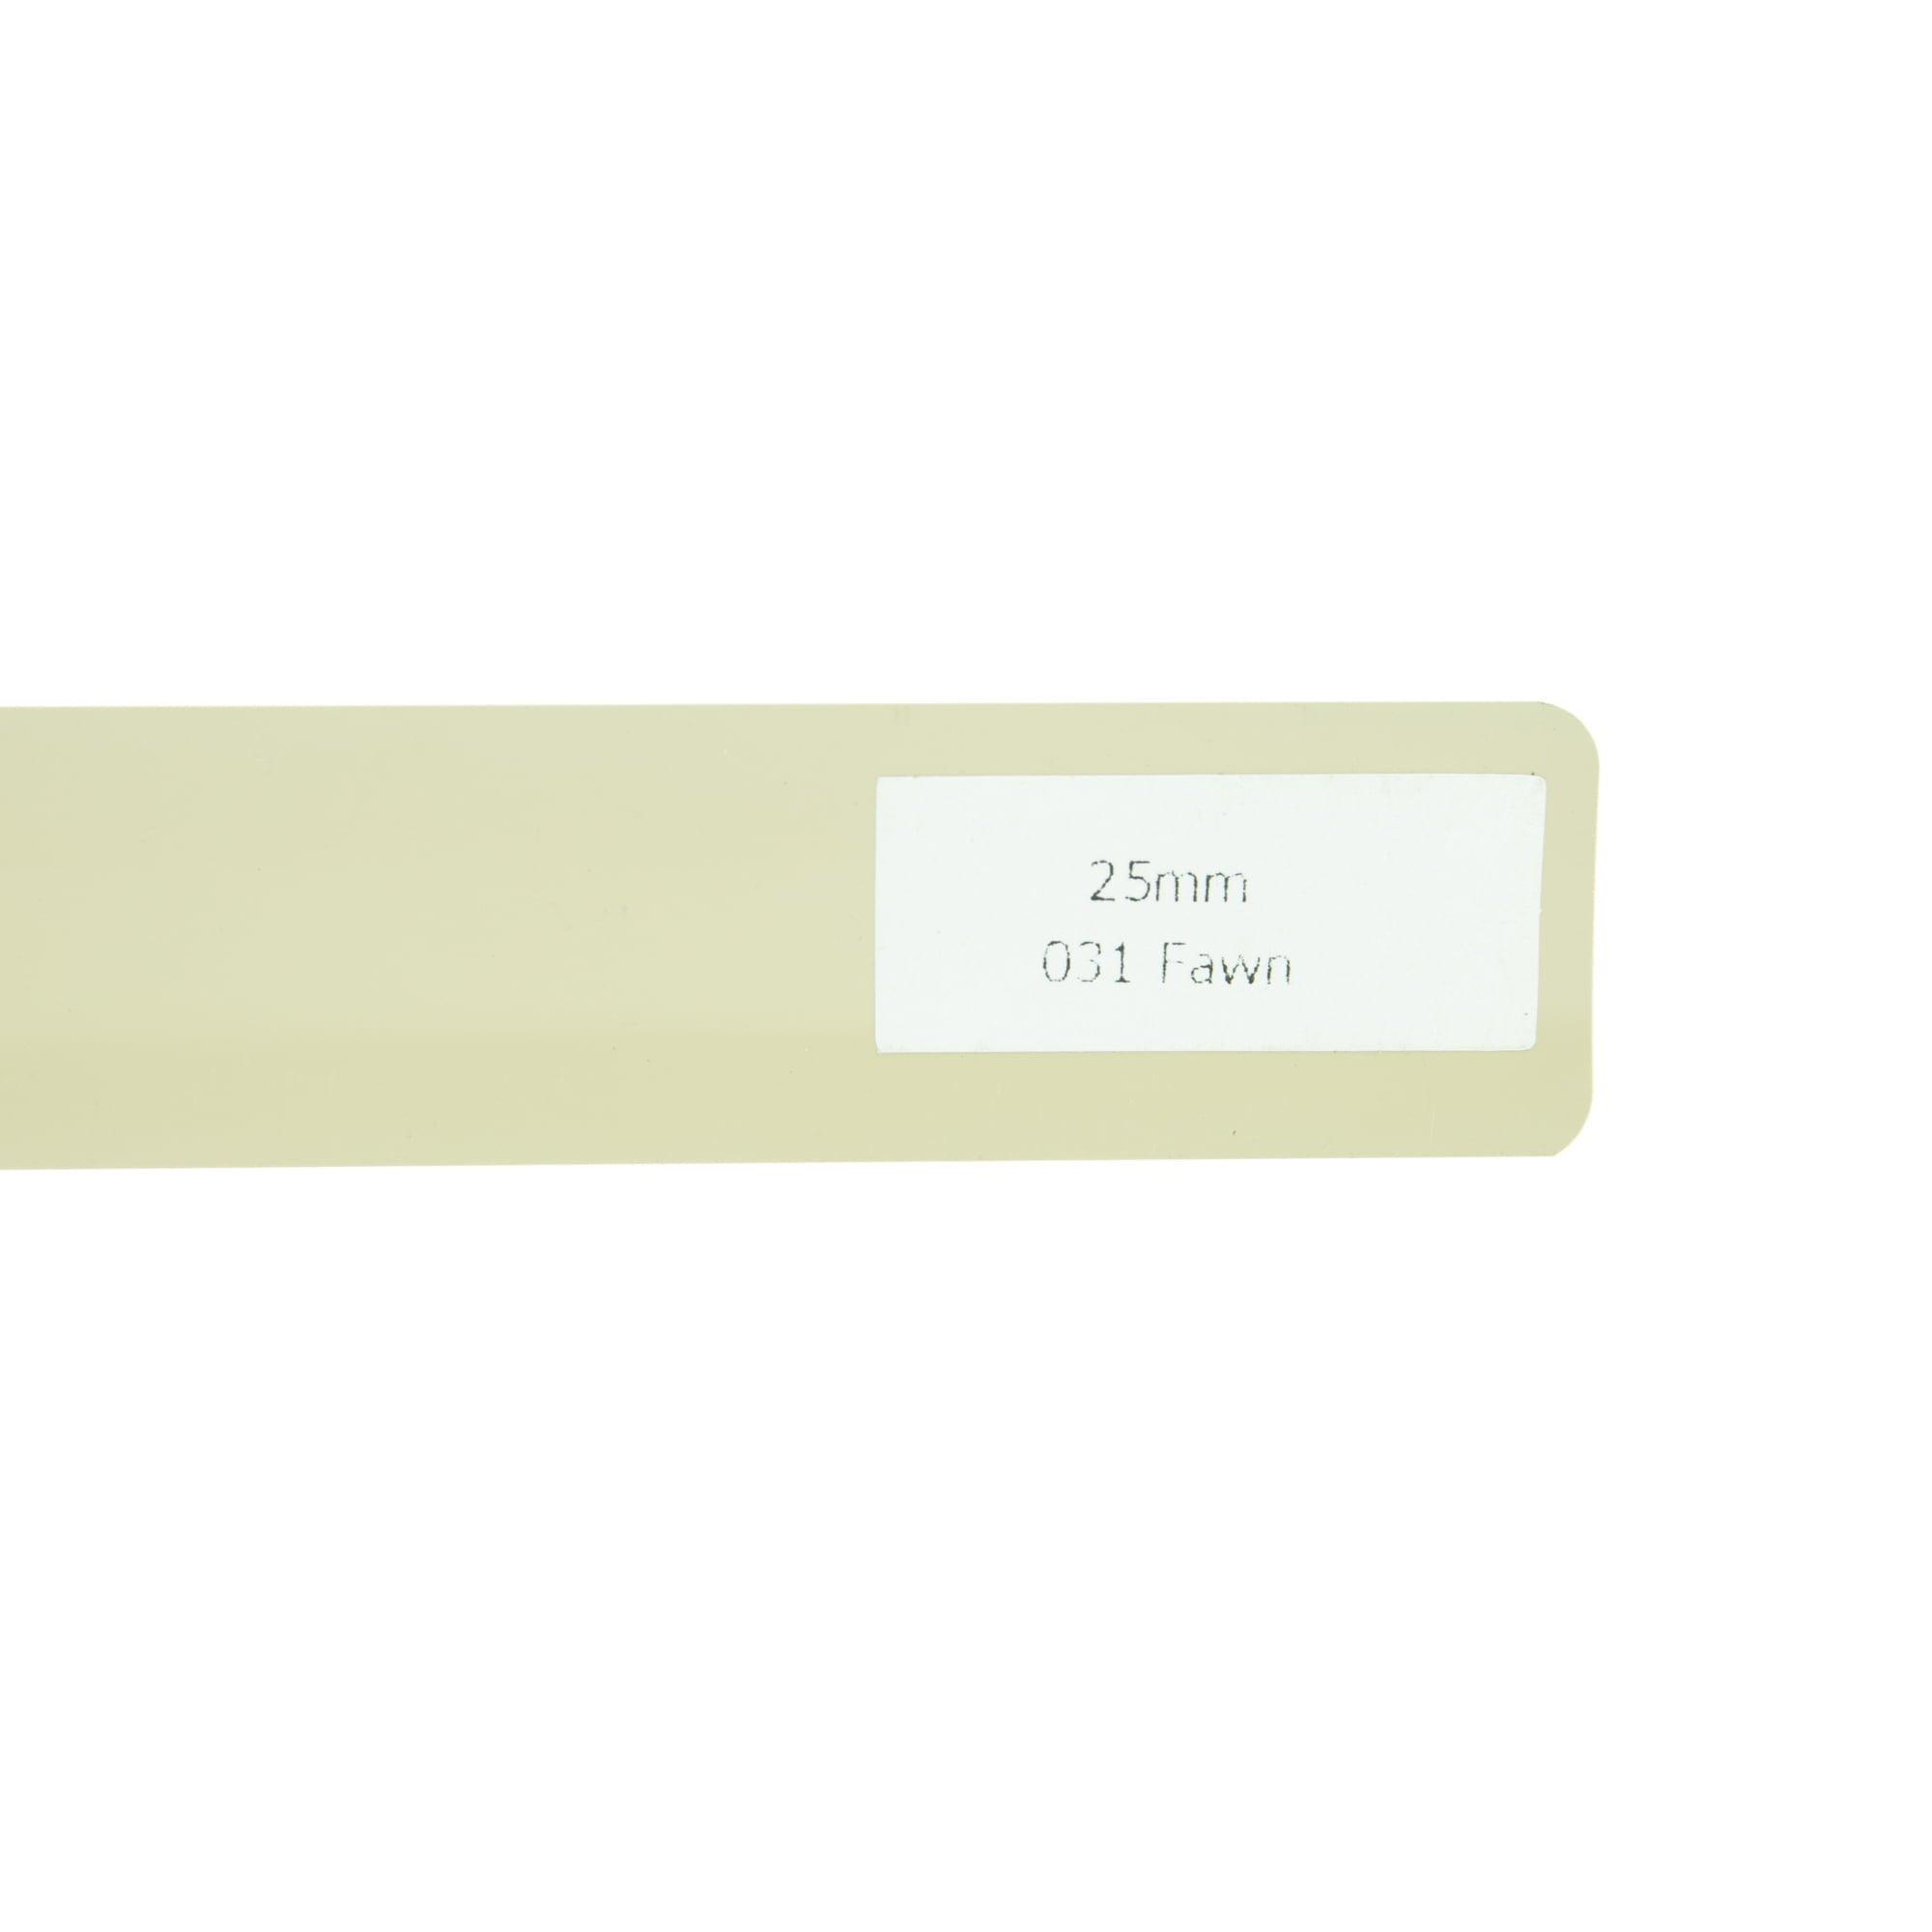 persiana horizontal 1,75 largura e 1,55 altura 031 fawn